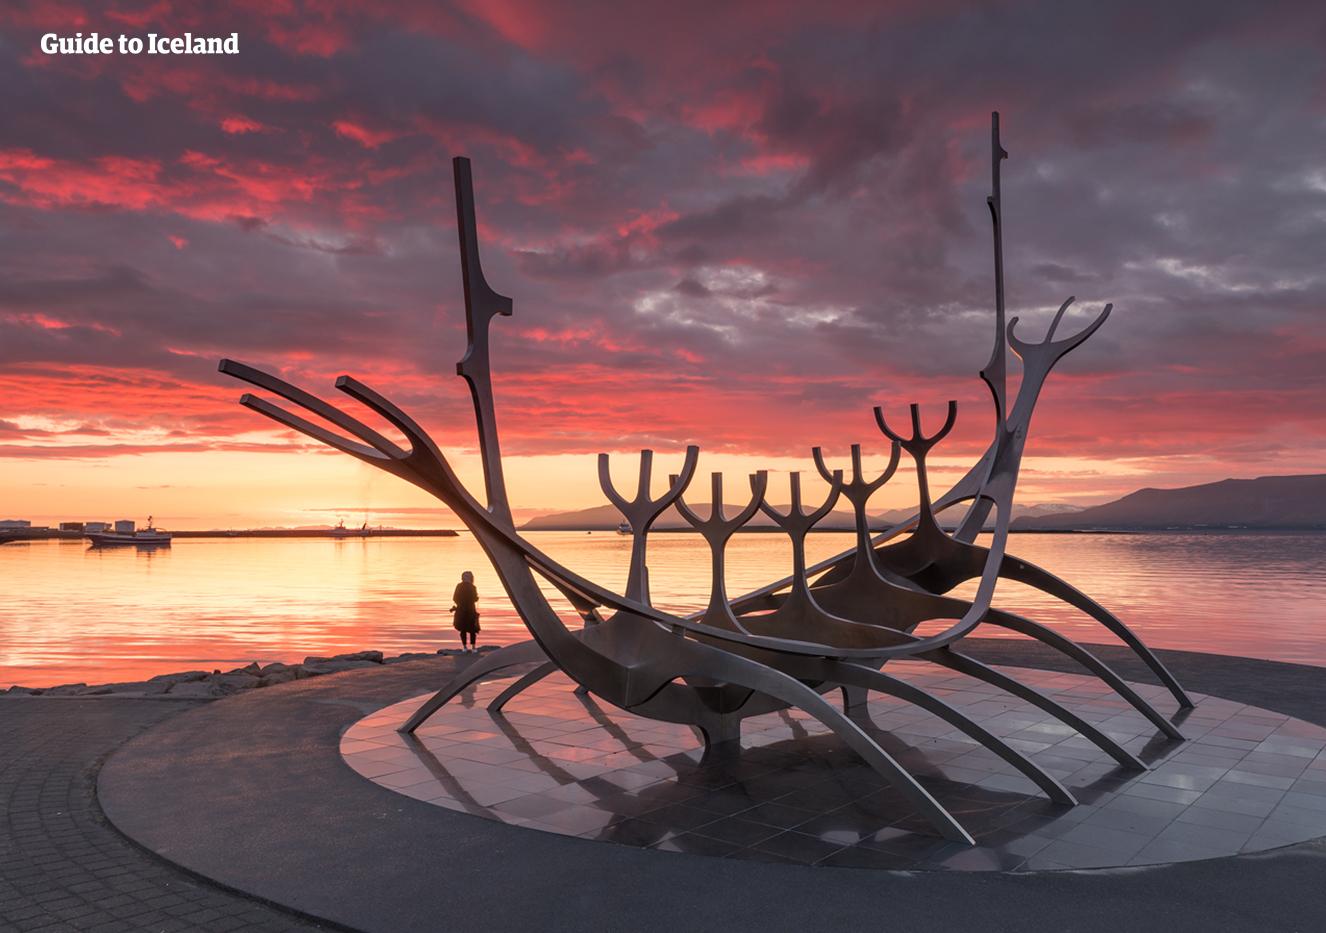 Автотур «Игра престолов» | Исландия за 10 дней - day 10